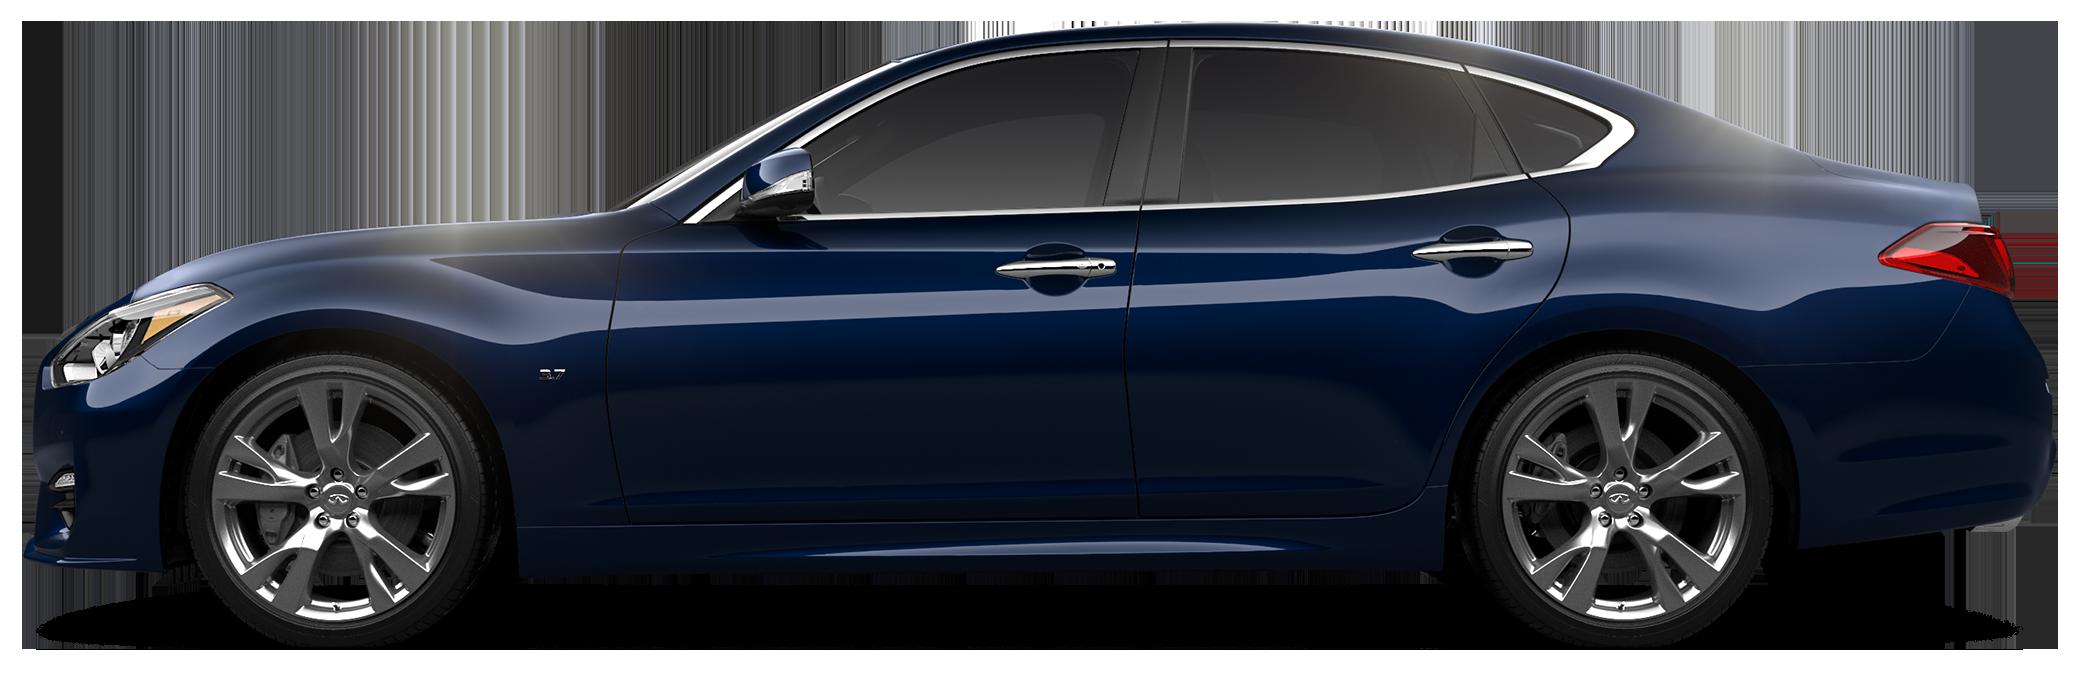 2019 INFINITI Q70 Sedan 3.7X LUXE